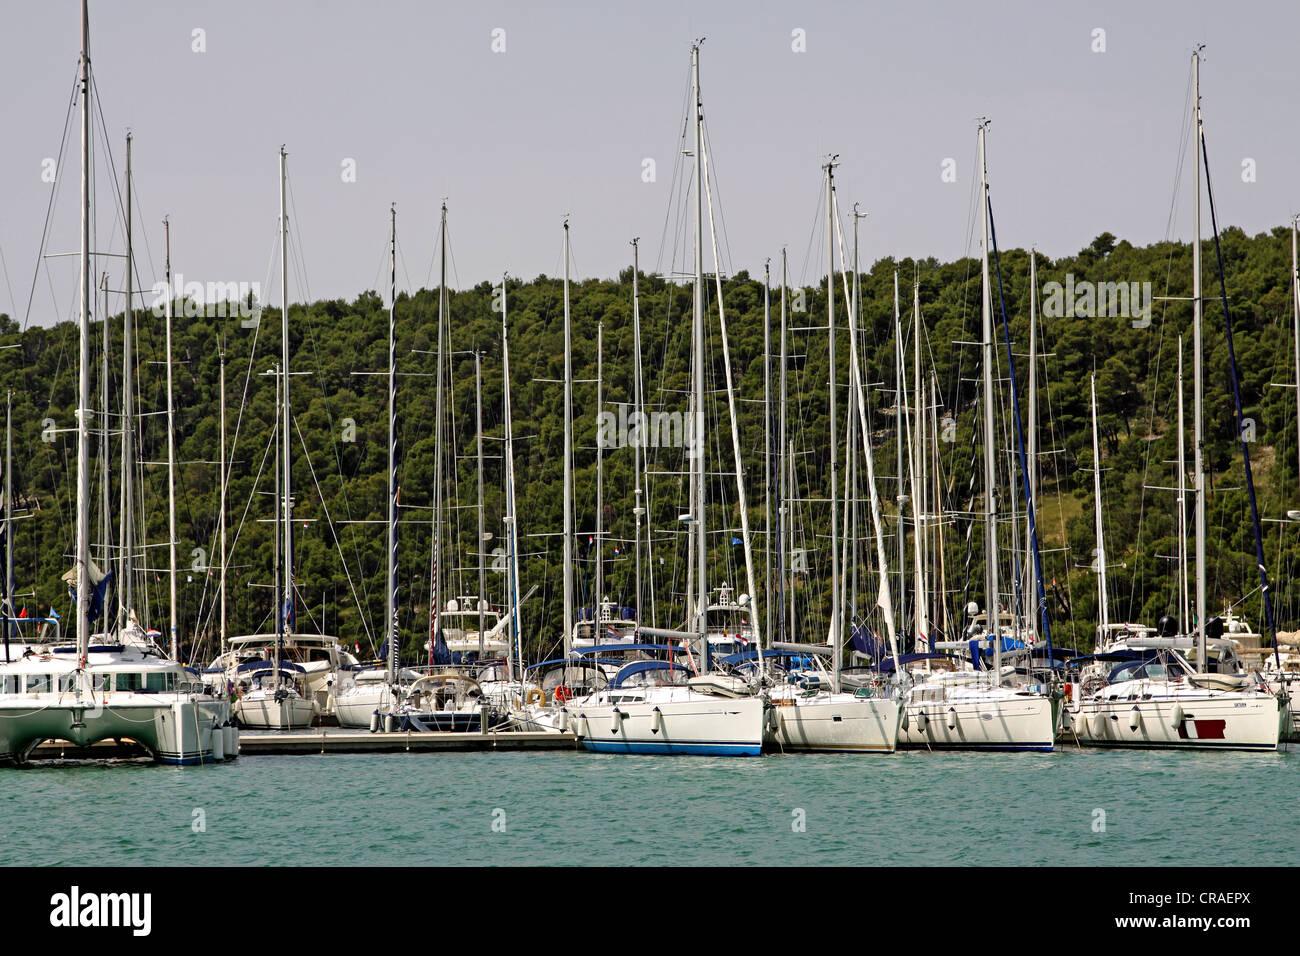 Marina, Fluss Krka Skradin, Dalmatien, Kroatien, Europa Stockfoto